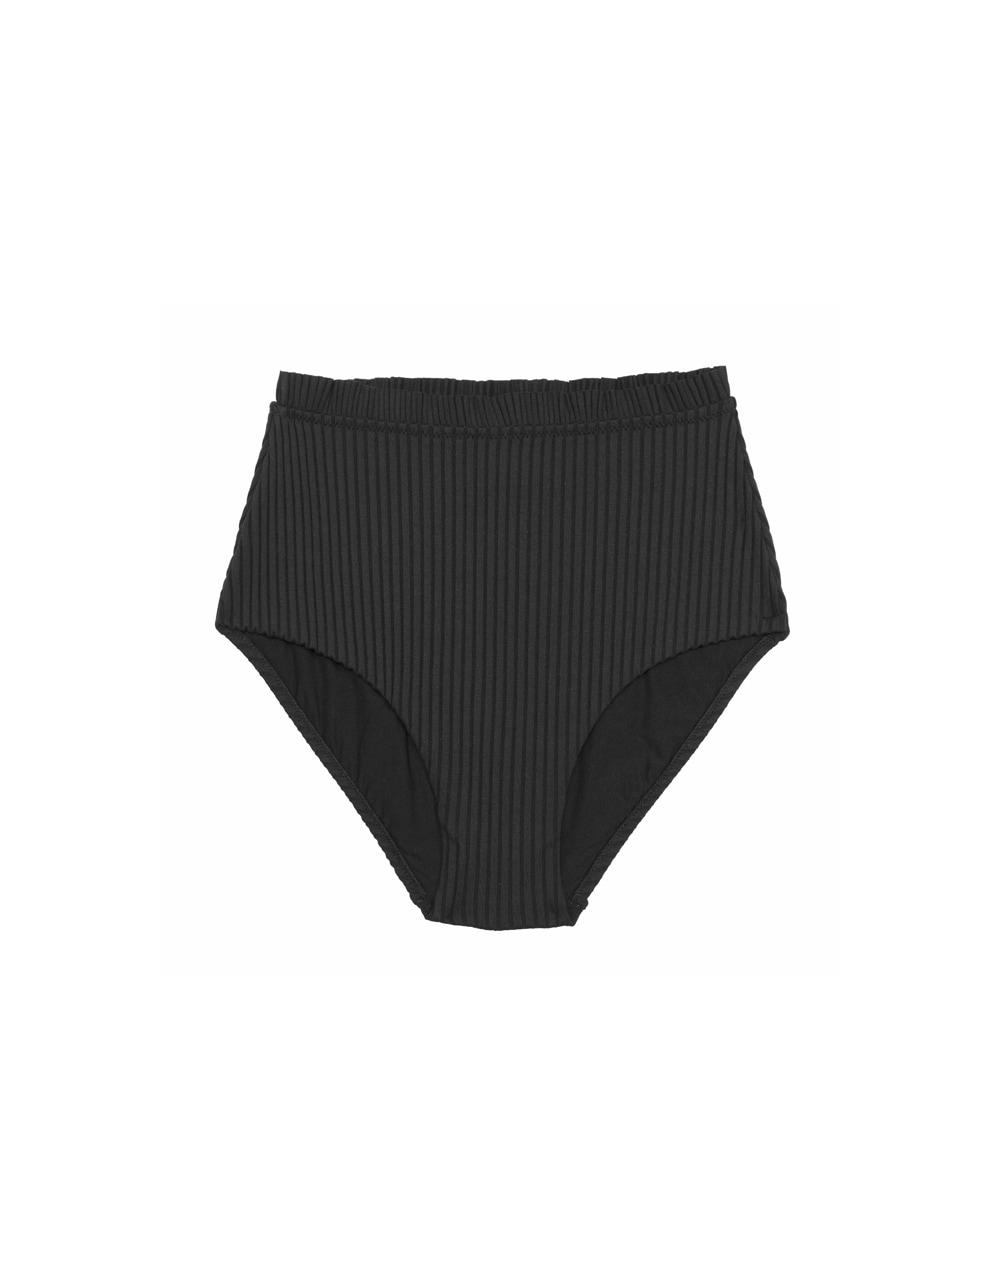 swimsuit high waist bikini bottom South Forever Black 30 € Girls In Paris photo 6